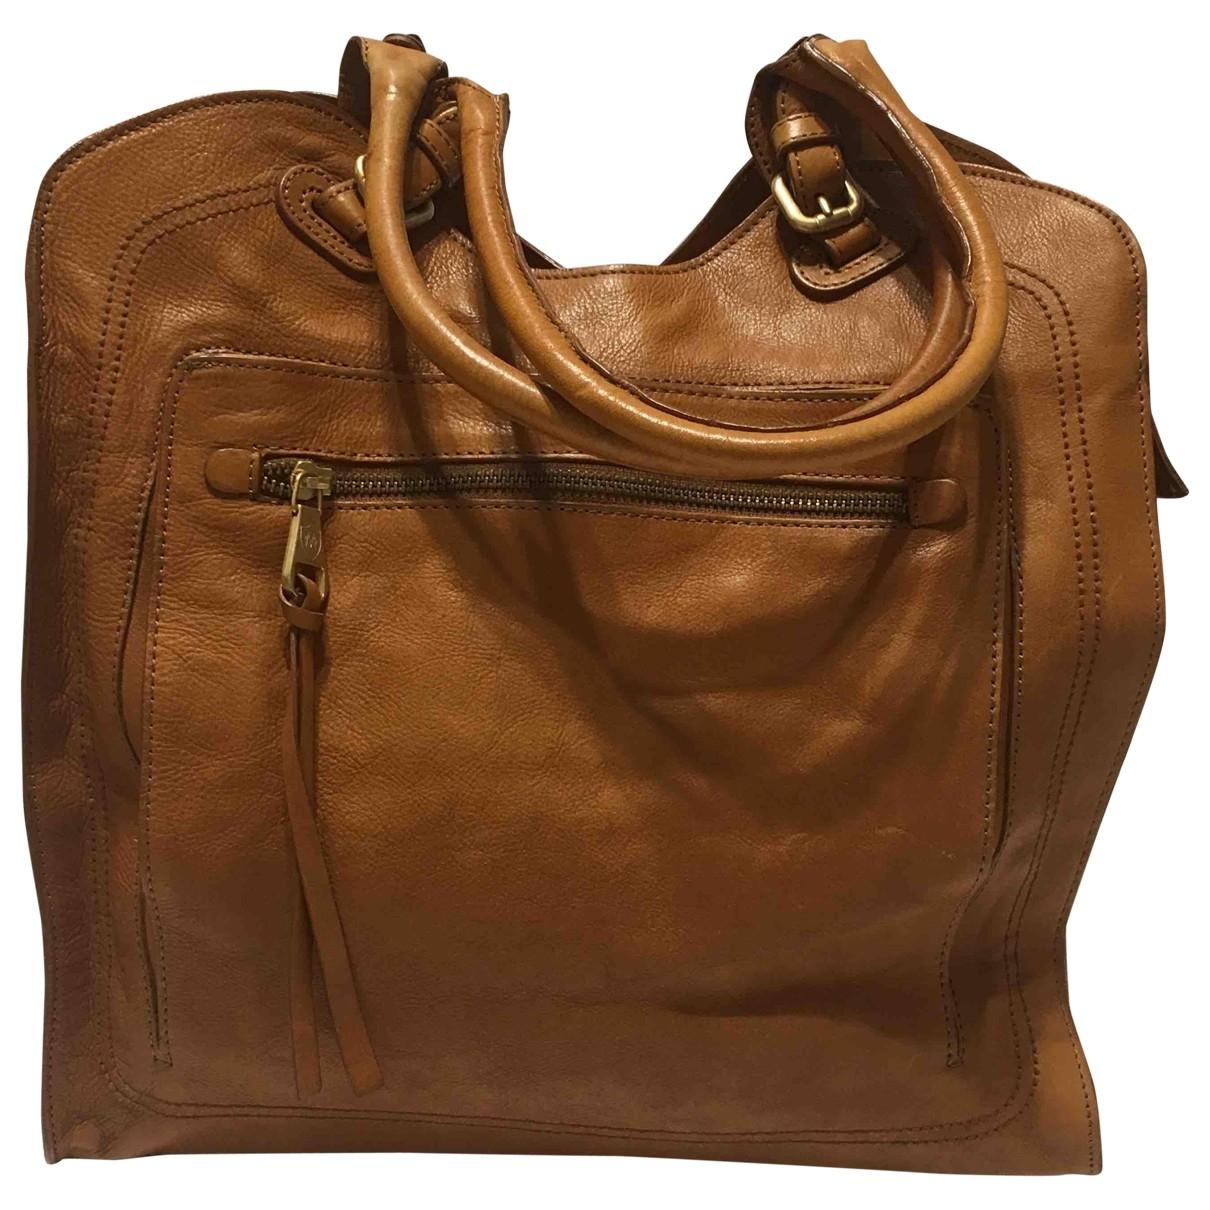 Massimo Dutti \N Handtasche in  Kamel Leder